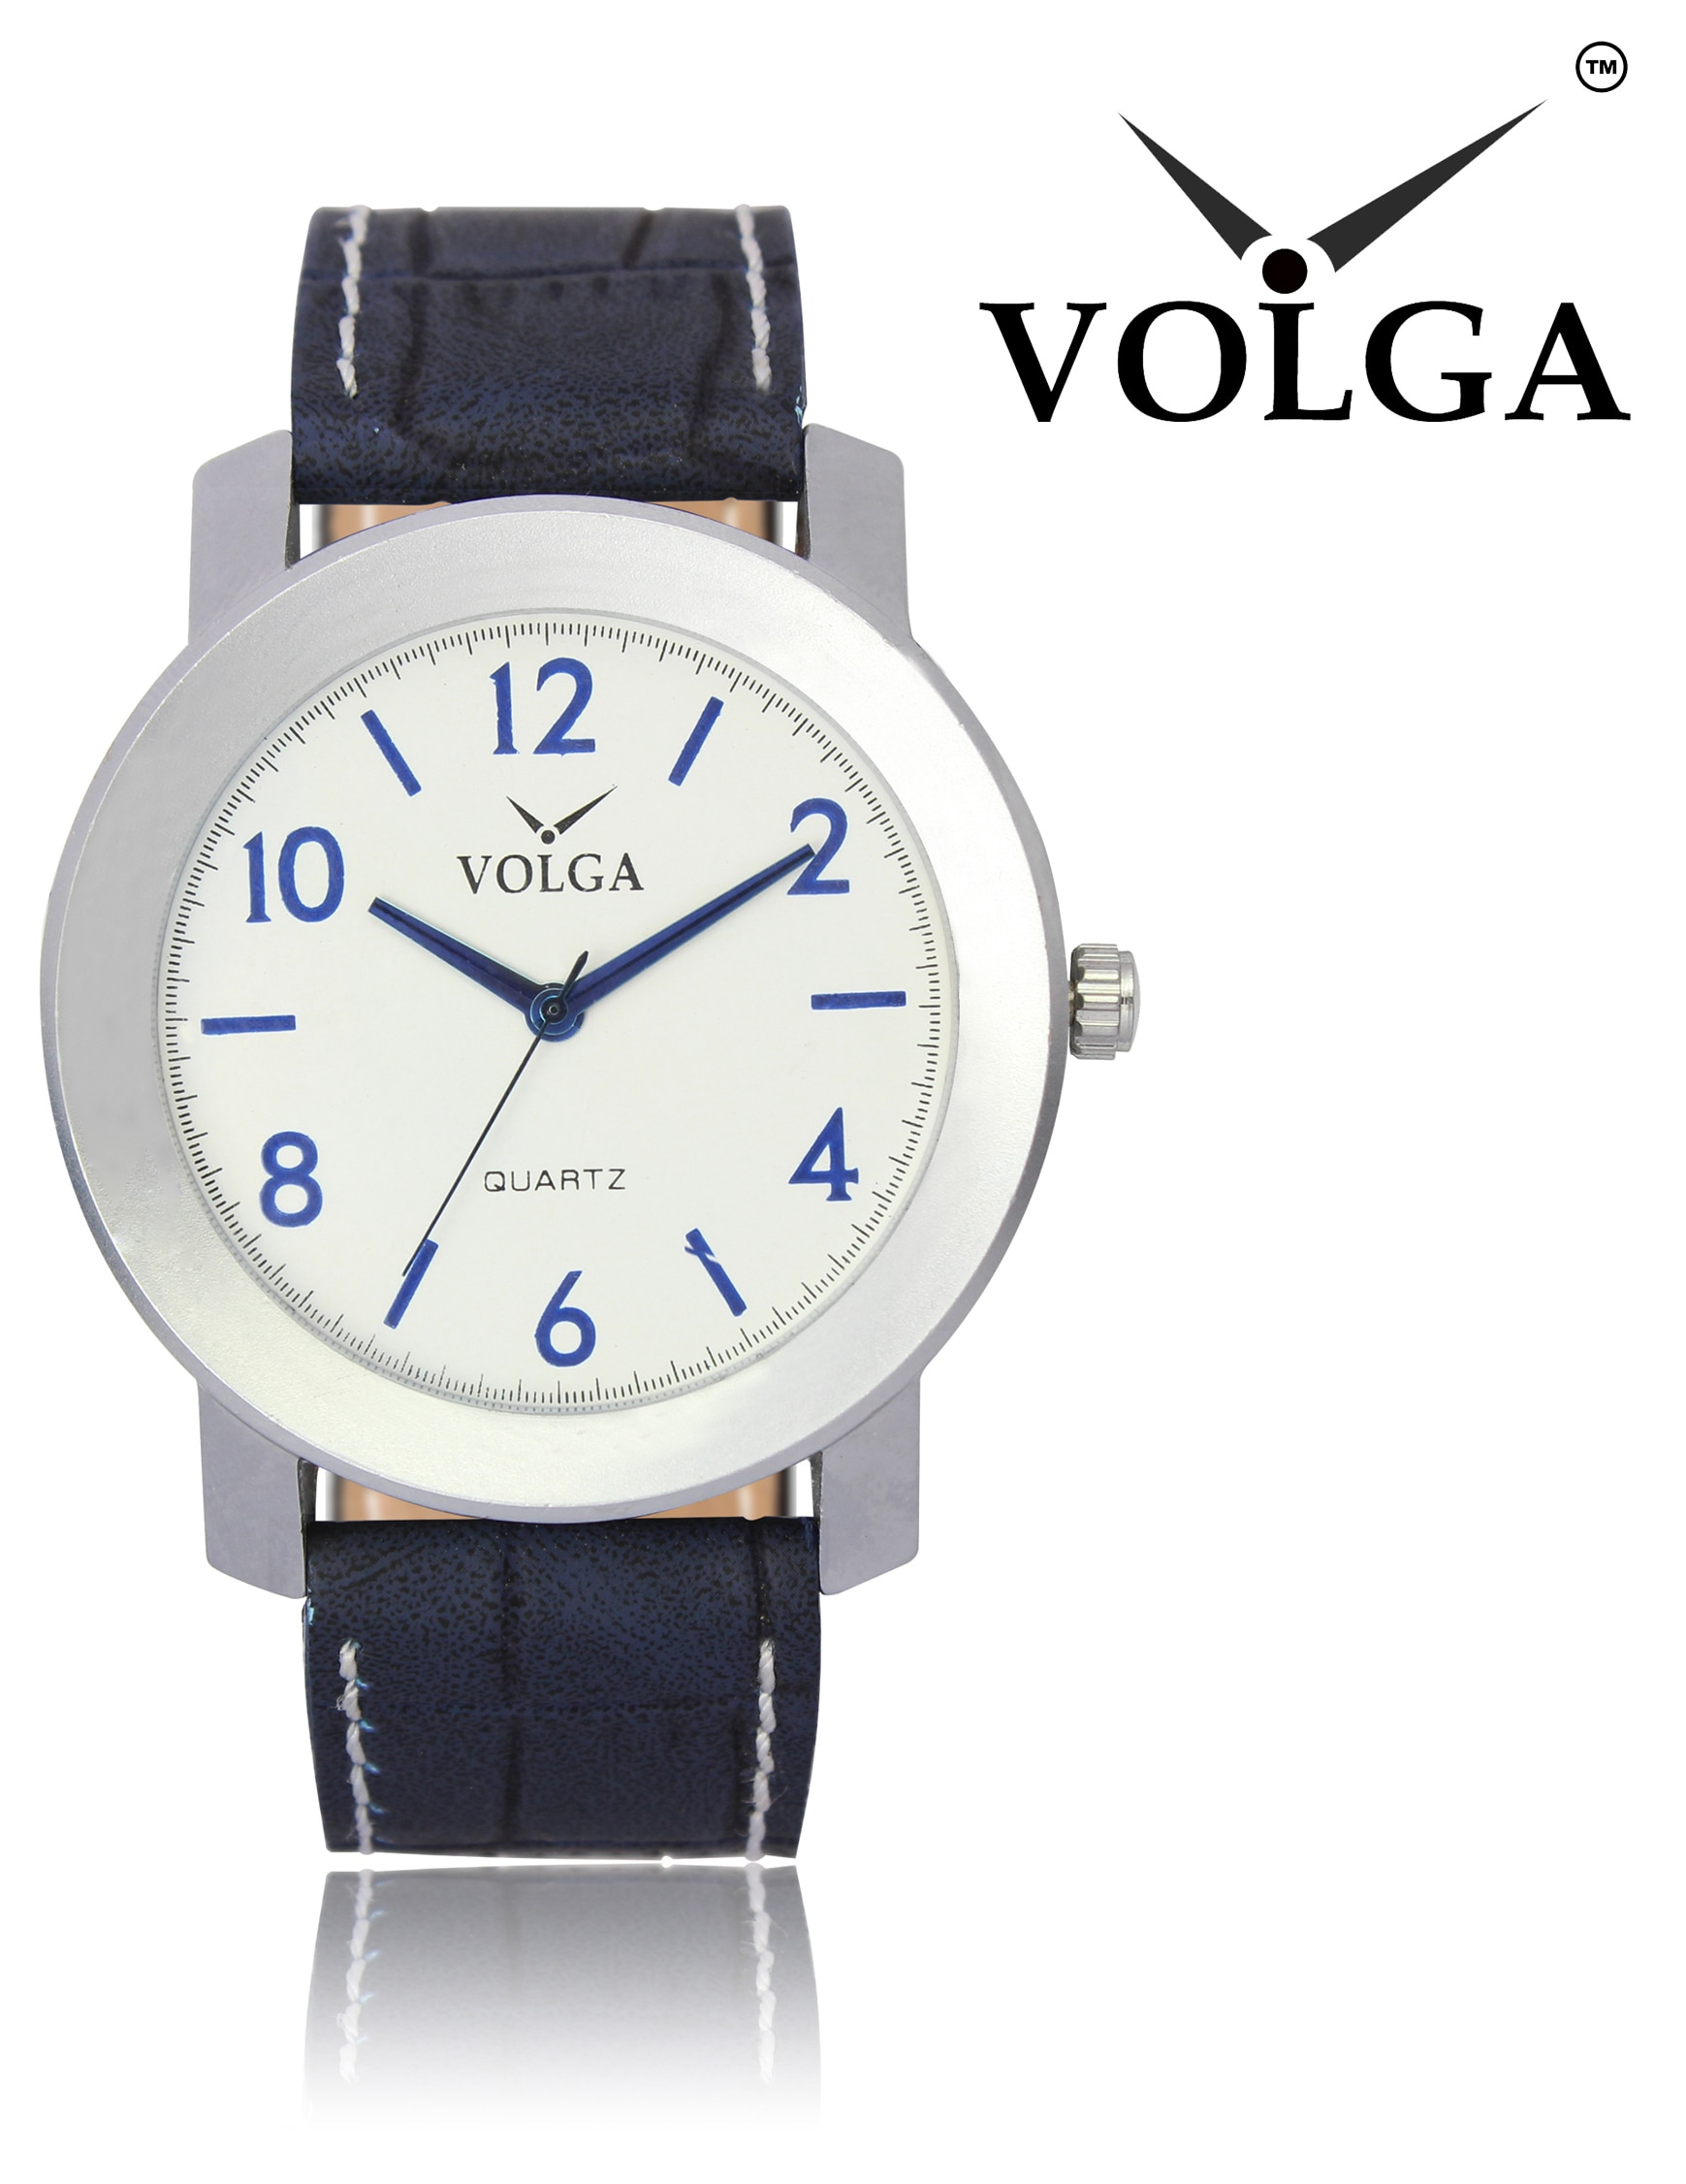 Volga Analogue Sports Dial Men's Watch